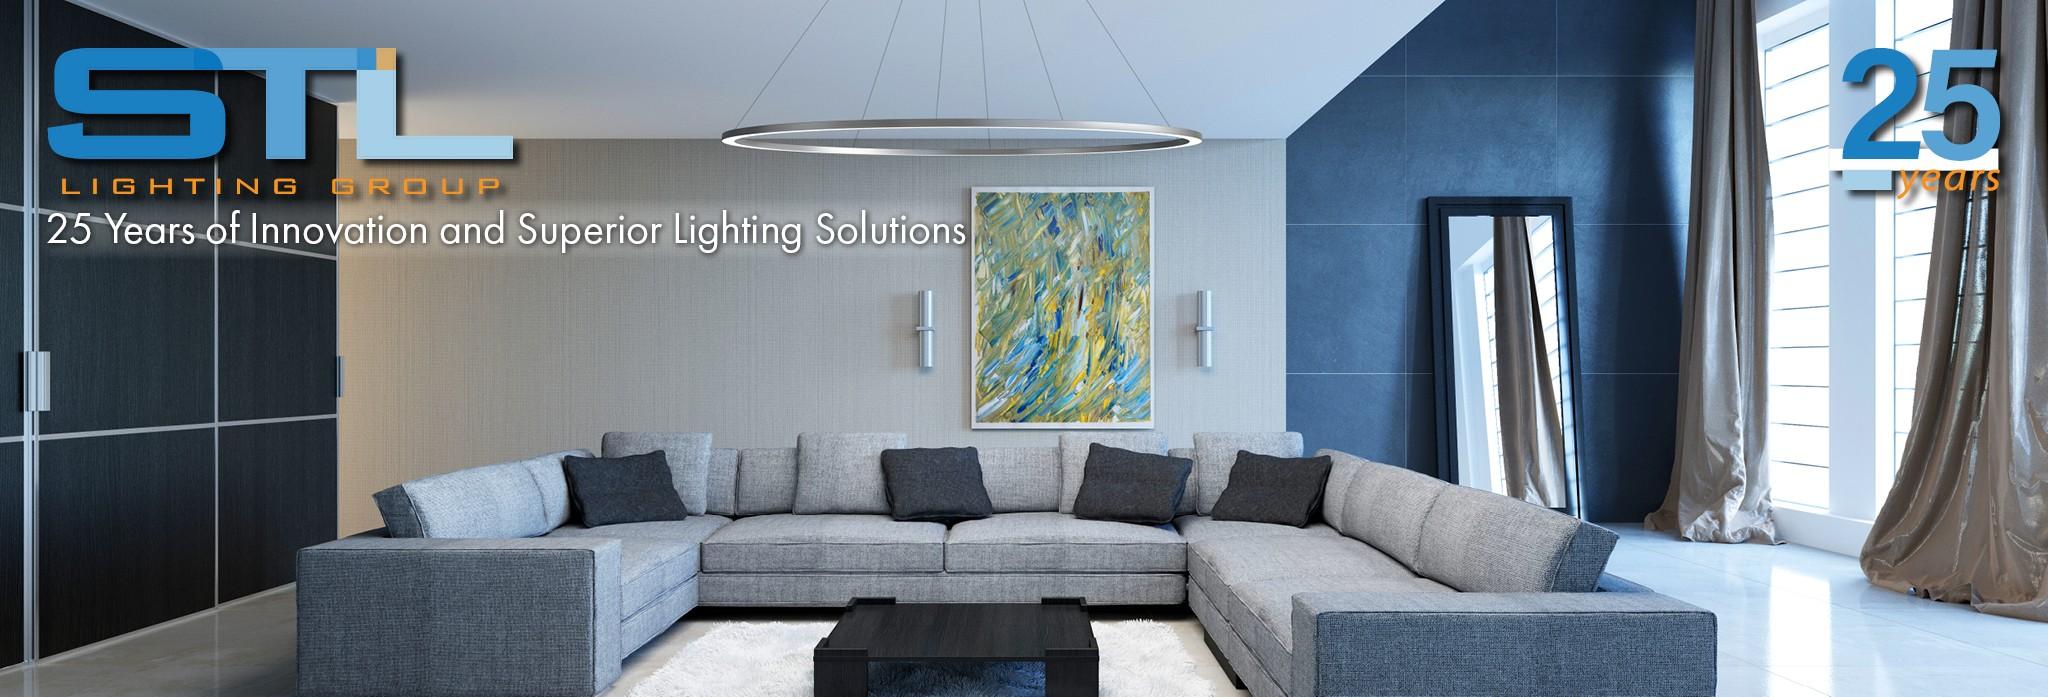 Stl Lighting Group Linkedin